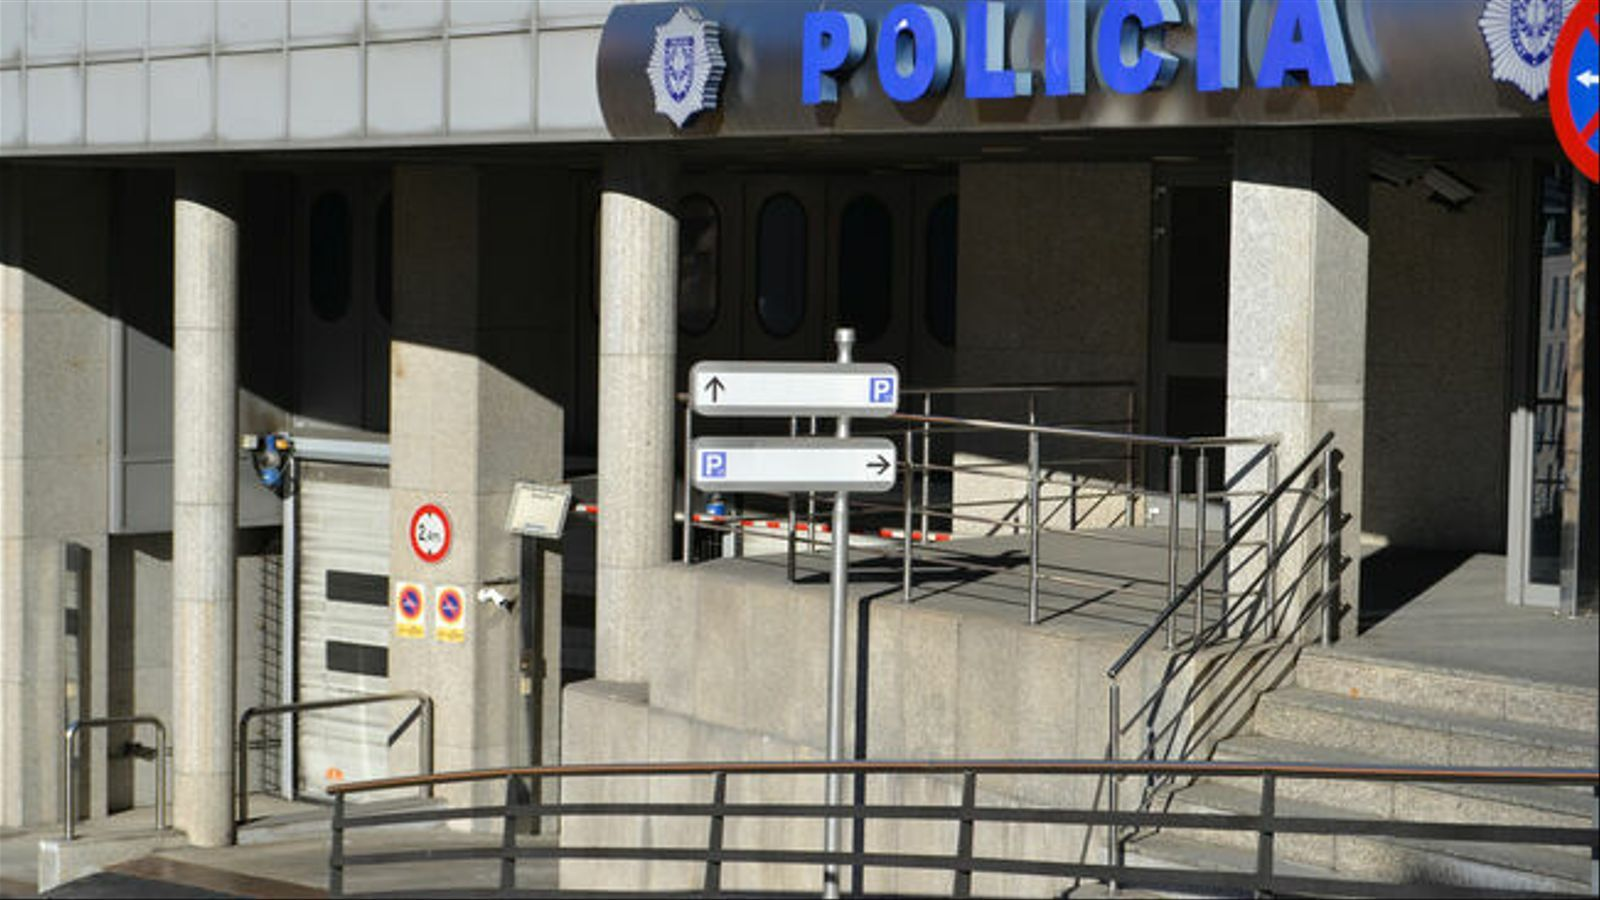 Edifici de la policia. / ARXIU